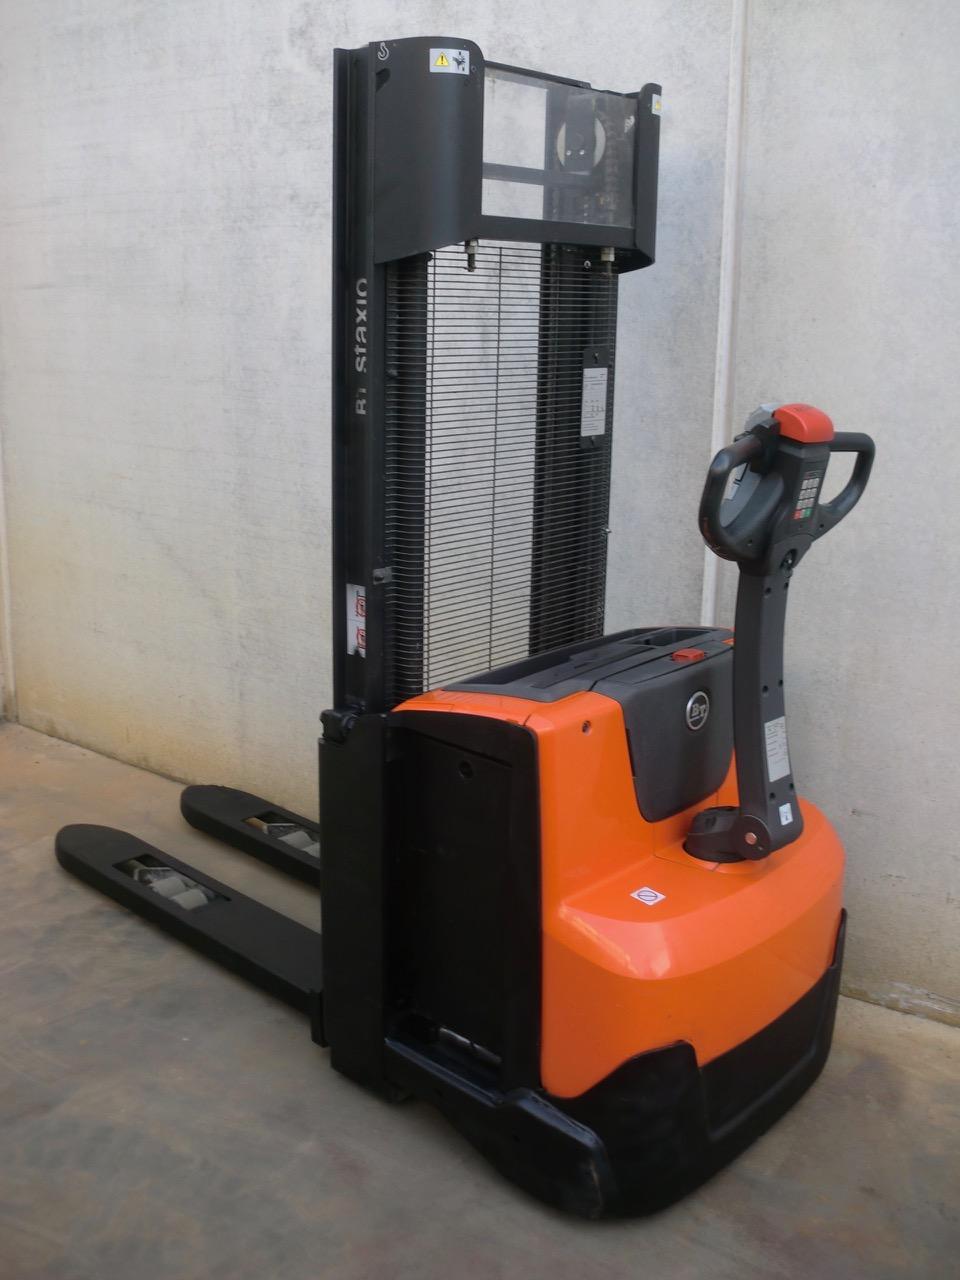 2015-bt-swe-120-385966-equipment-cover-image